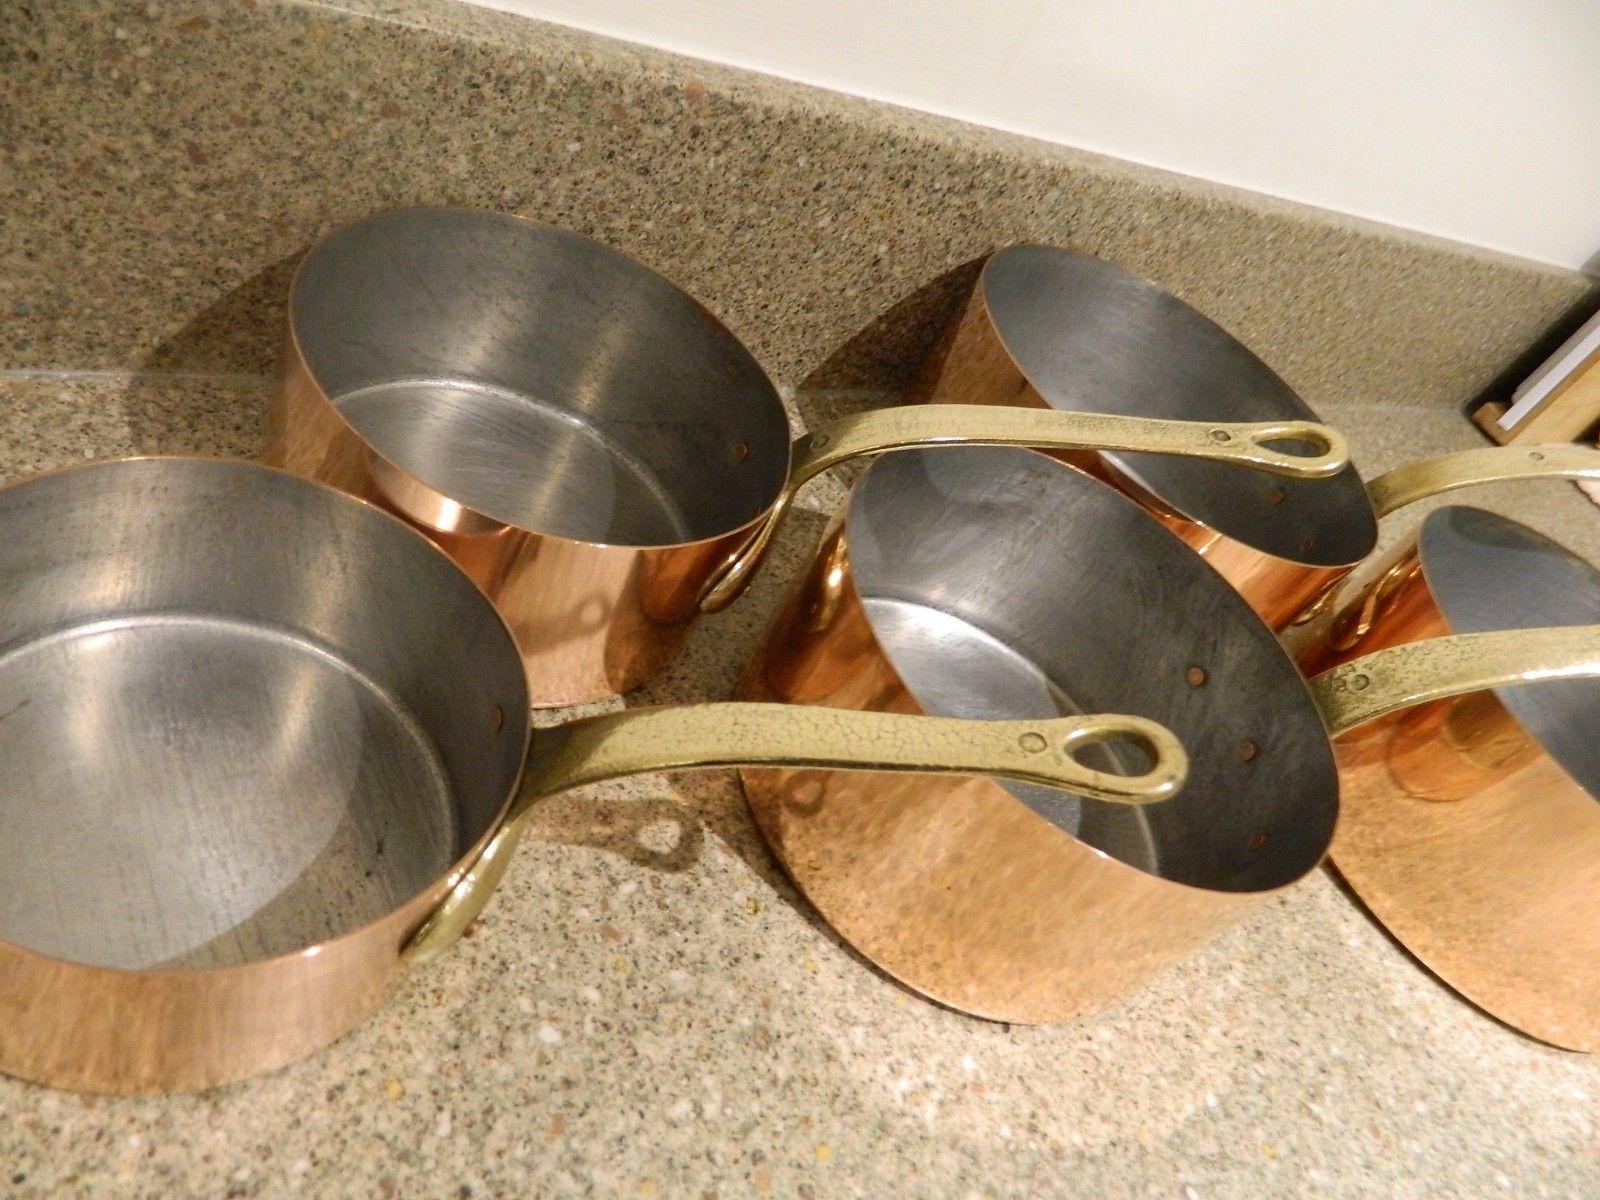 Copper pan tinning.